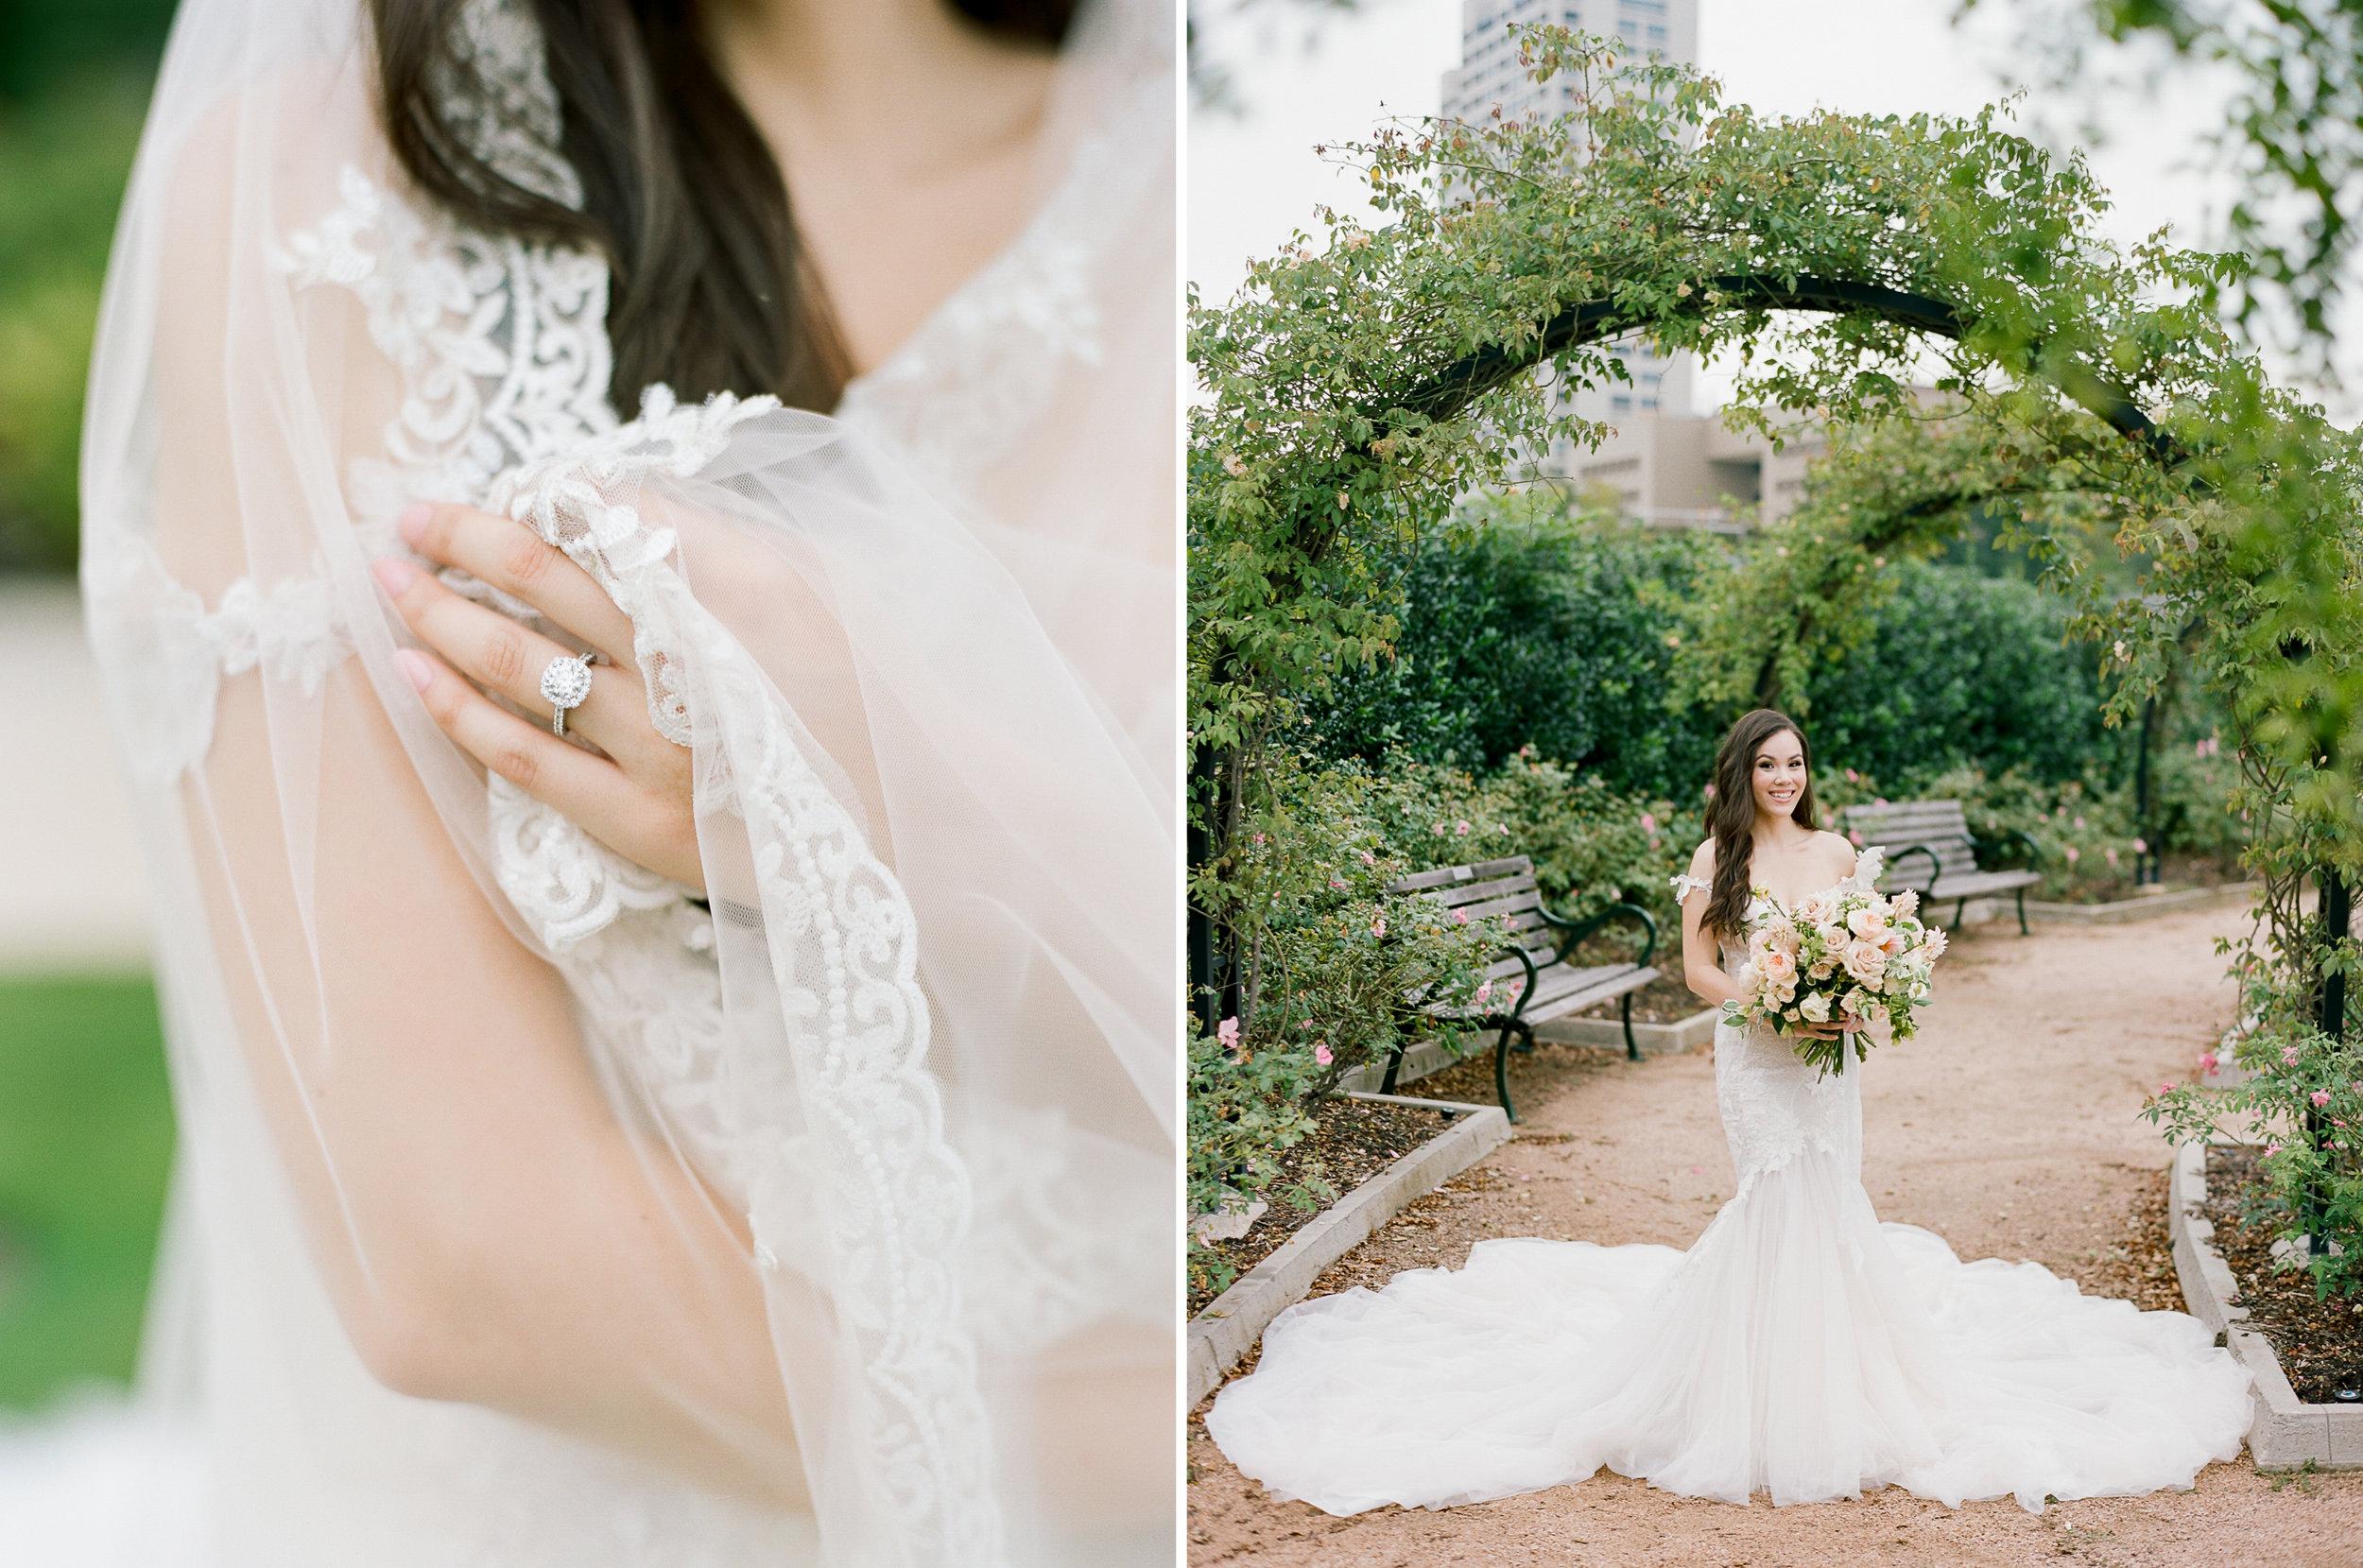 Fine-Art-Film-Houston-Wedding-Photographer-Best-Top-Luxury-Texas-Austin-Dallas-Destination-Dana-Fernandez-Photography-Portrait-Bridals-McGovern-Centennial-Gardens-101.jpg